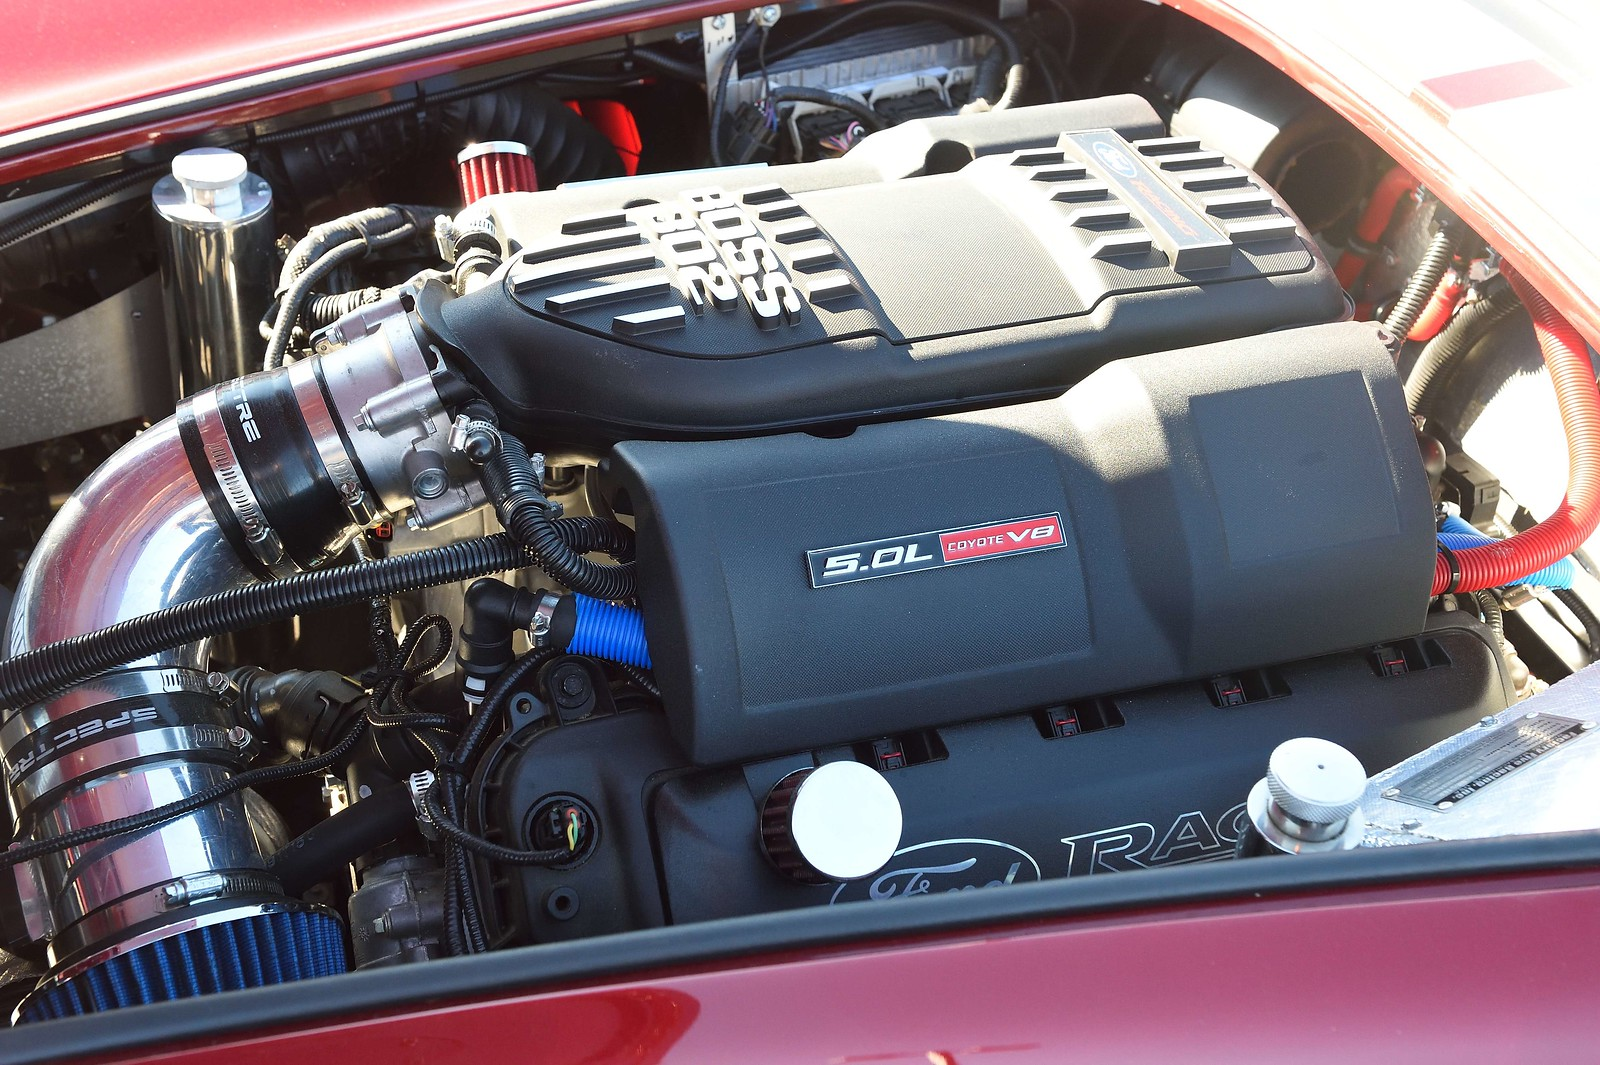 BOSS 302 Intake manifold - Ford F150 Forum - Community of